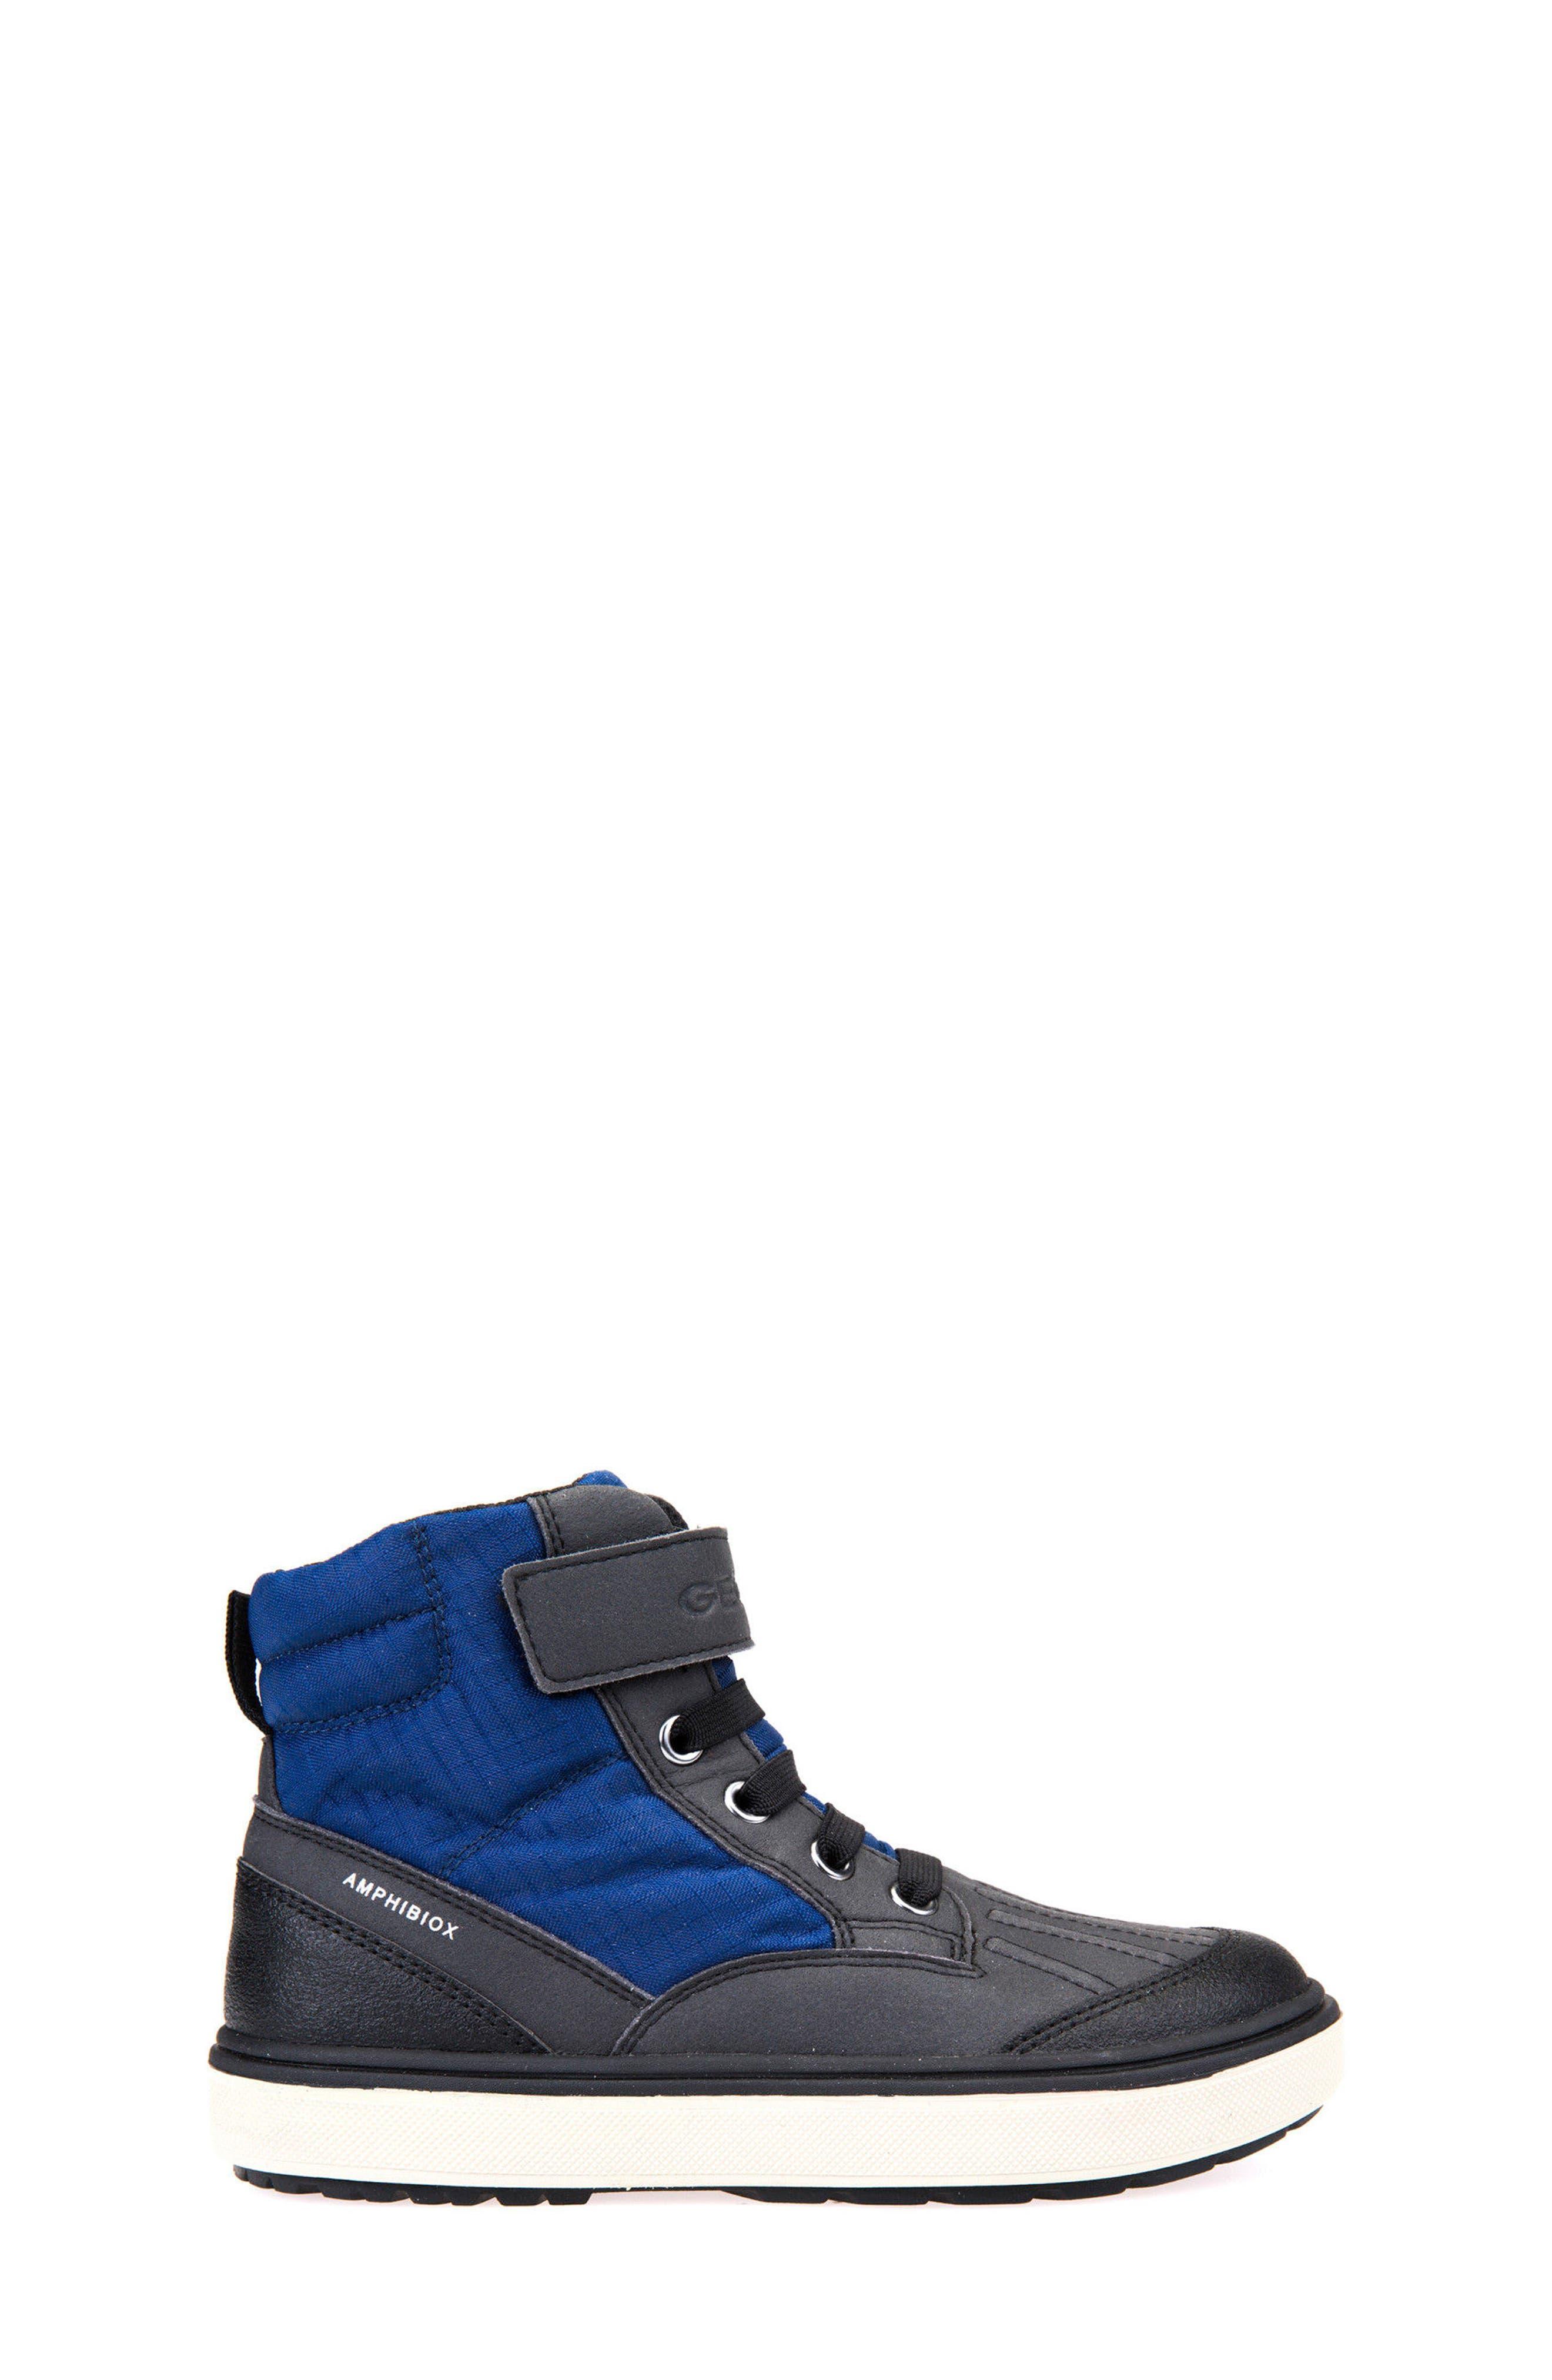 Alternate Image 3  - Geox 'Mattias - ABX' Amphibiox® Waterproof Sneaker (Toddler, Little Kid & Big Kid)